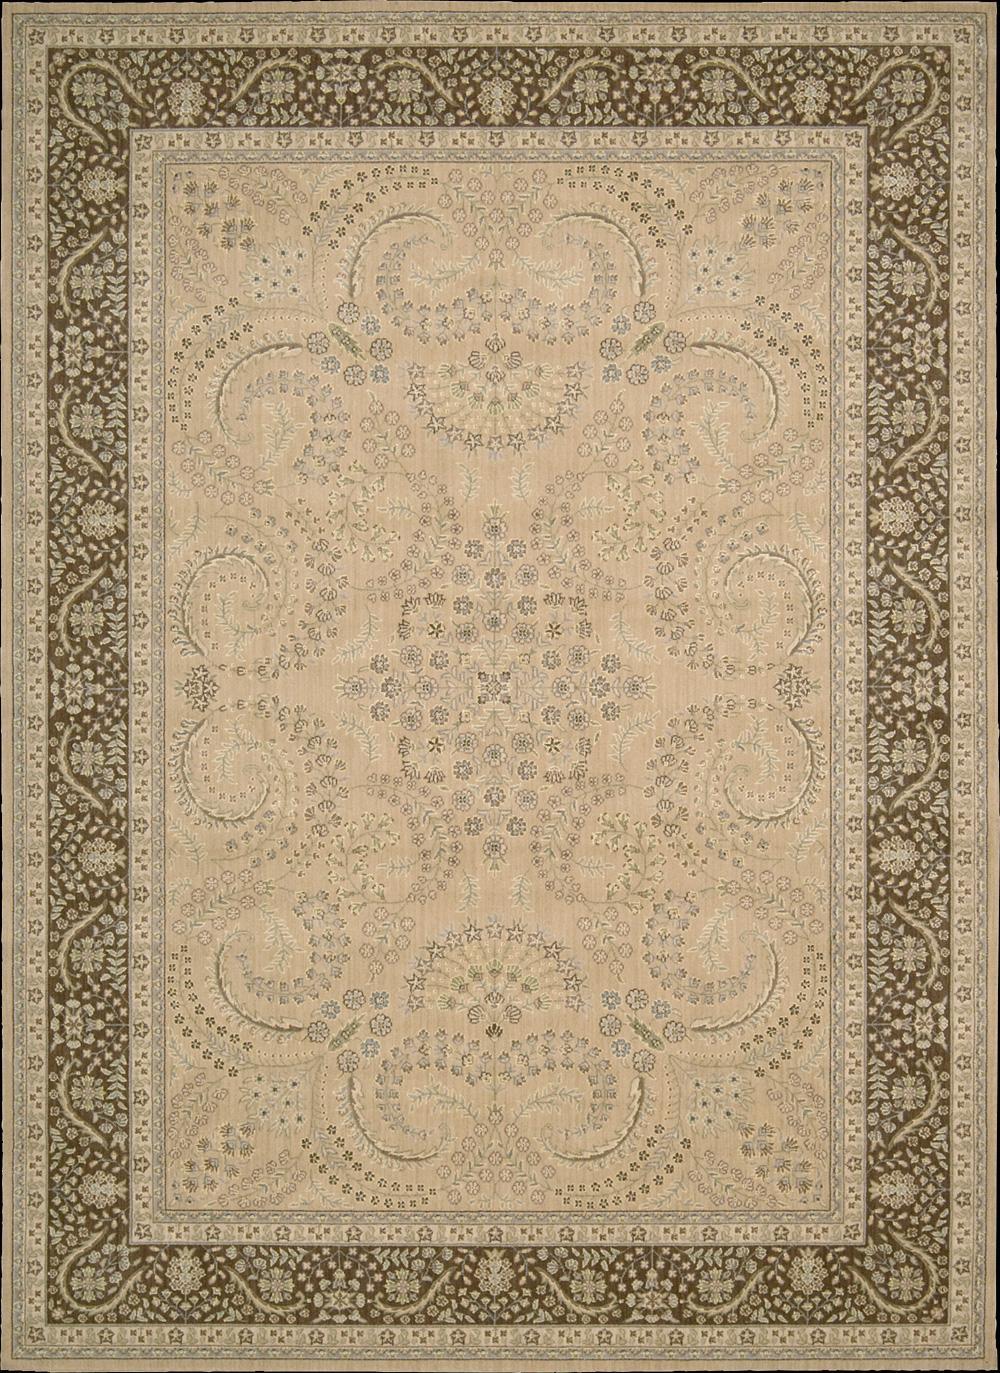 Nourison Persian Empire Area Rug 12' x 15' - Item Number: 44382